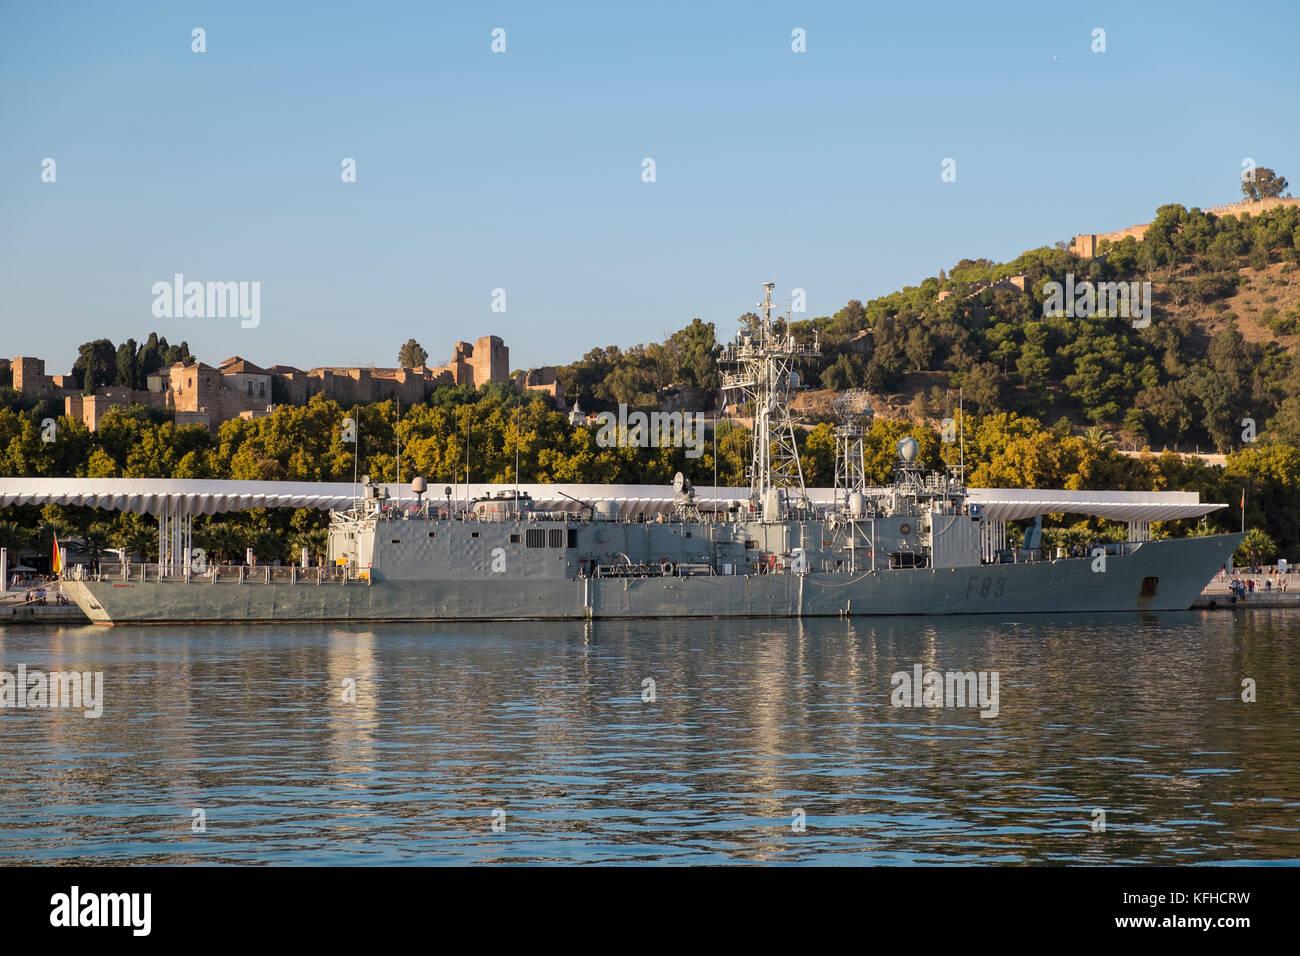 The Spanish frigate Numancia (F83). Port of Málaga, Spain. October 29th, 2017. - Stock Image